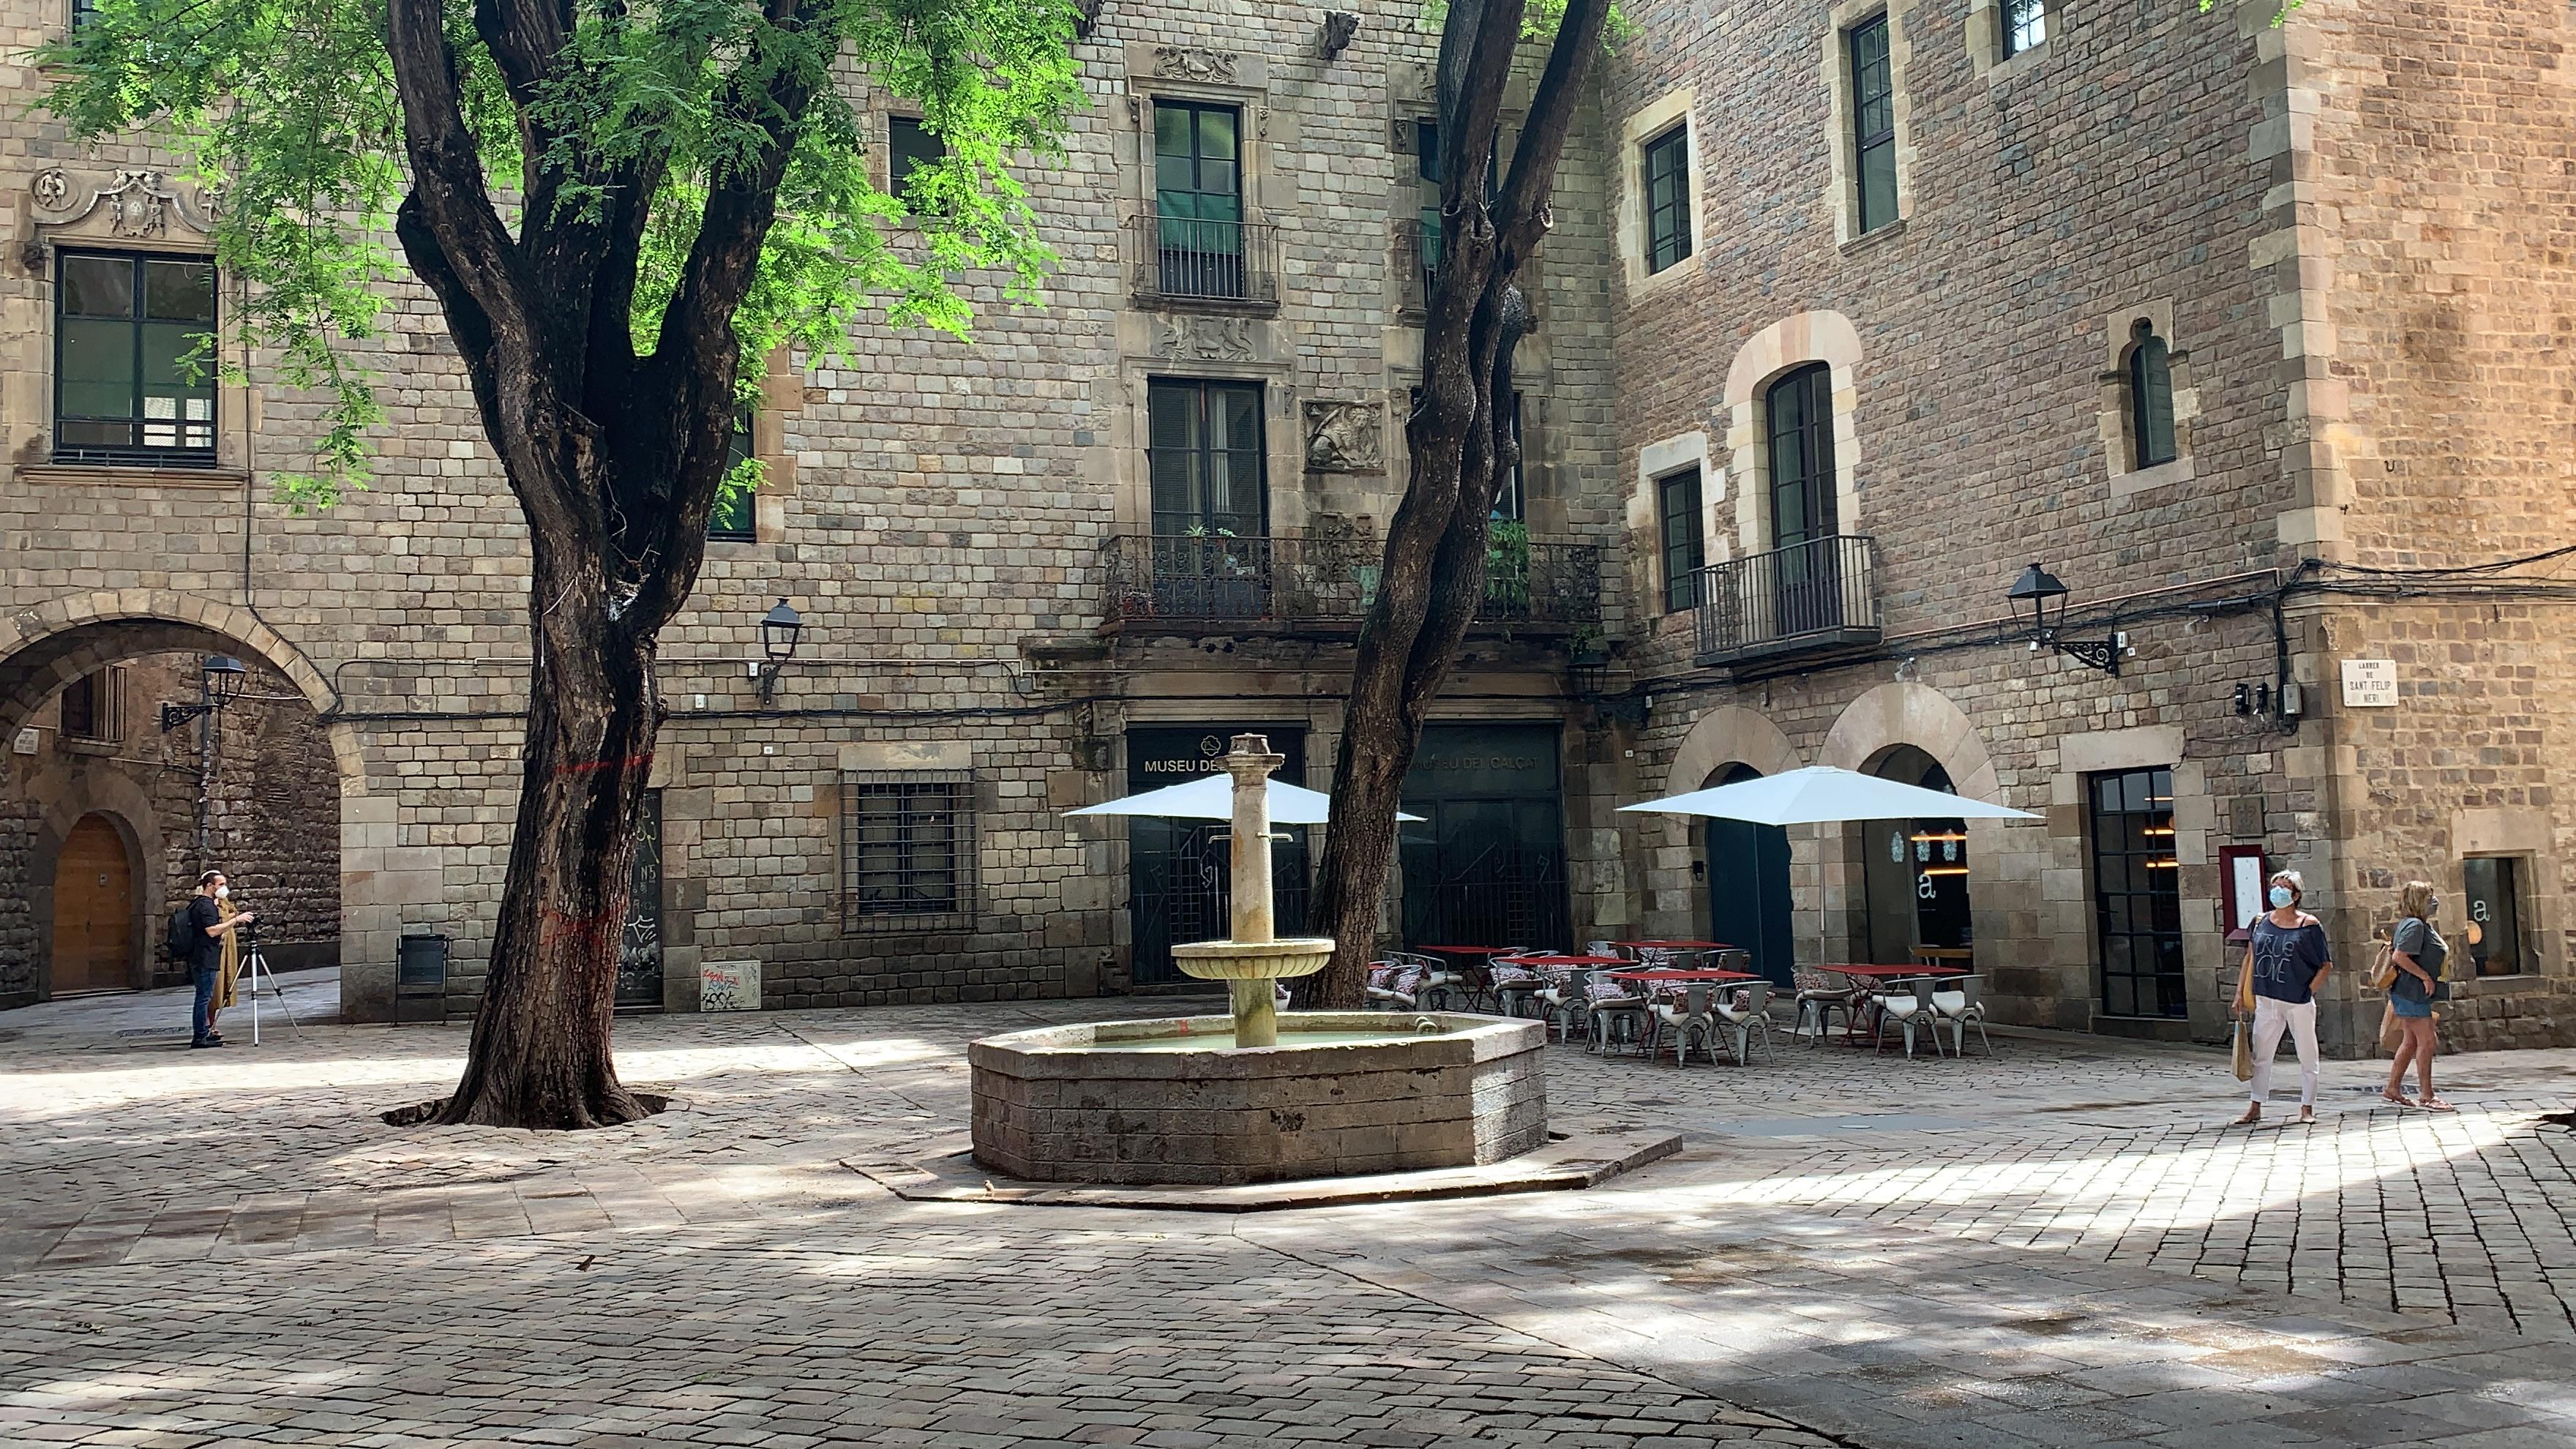 St. Felip Neri square